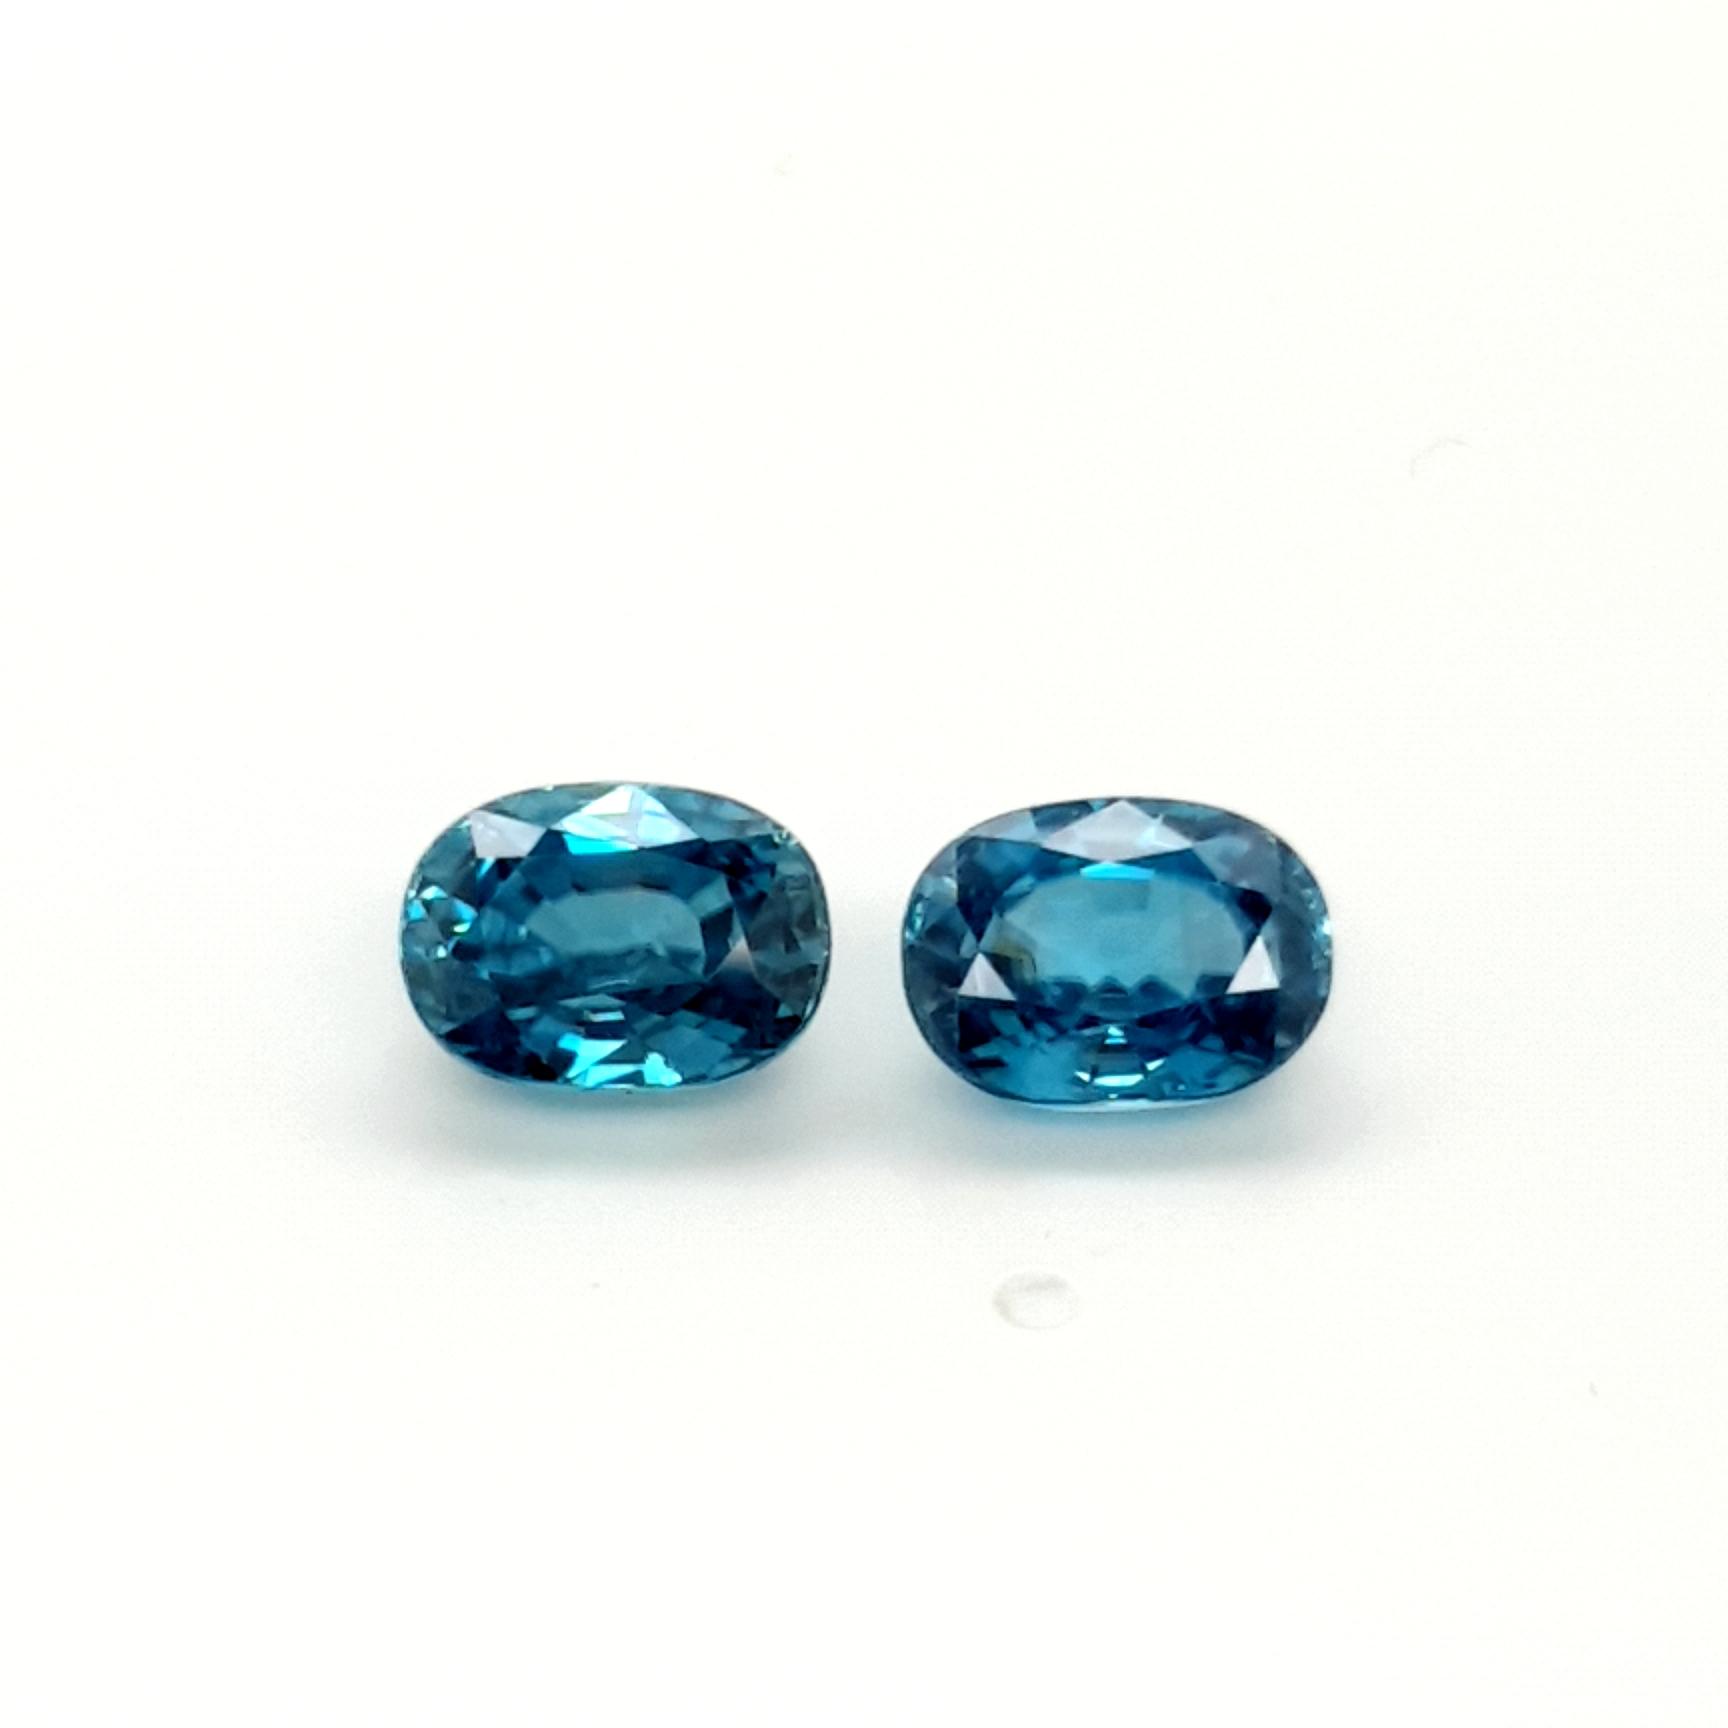 9,44ct Starlight Blue Zircon ZCK16D3 Claudia Hamann